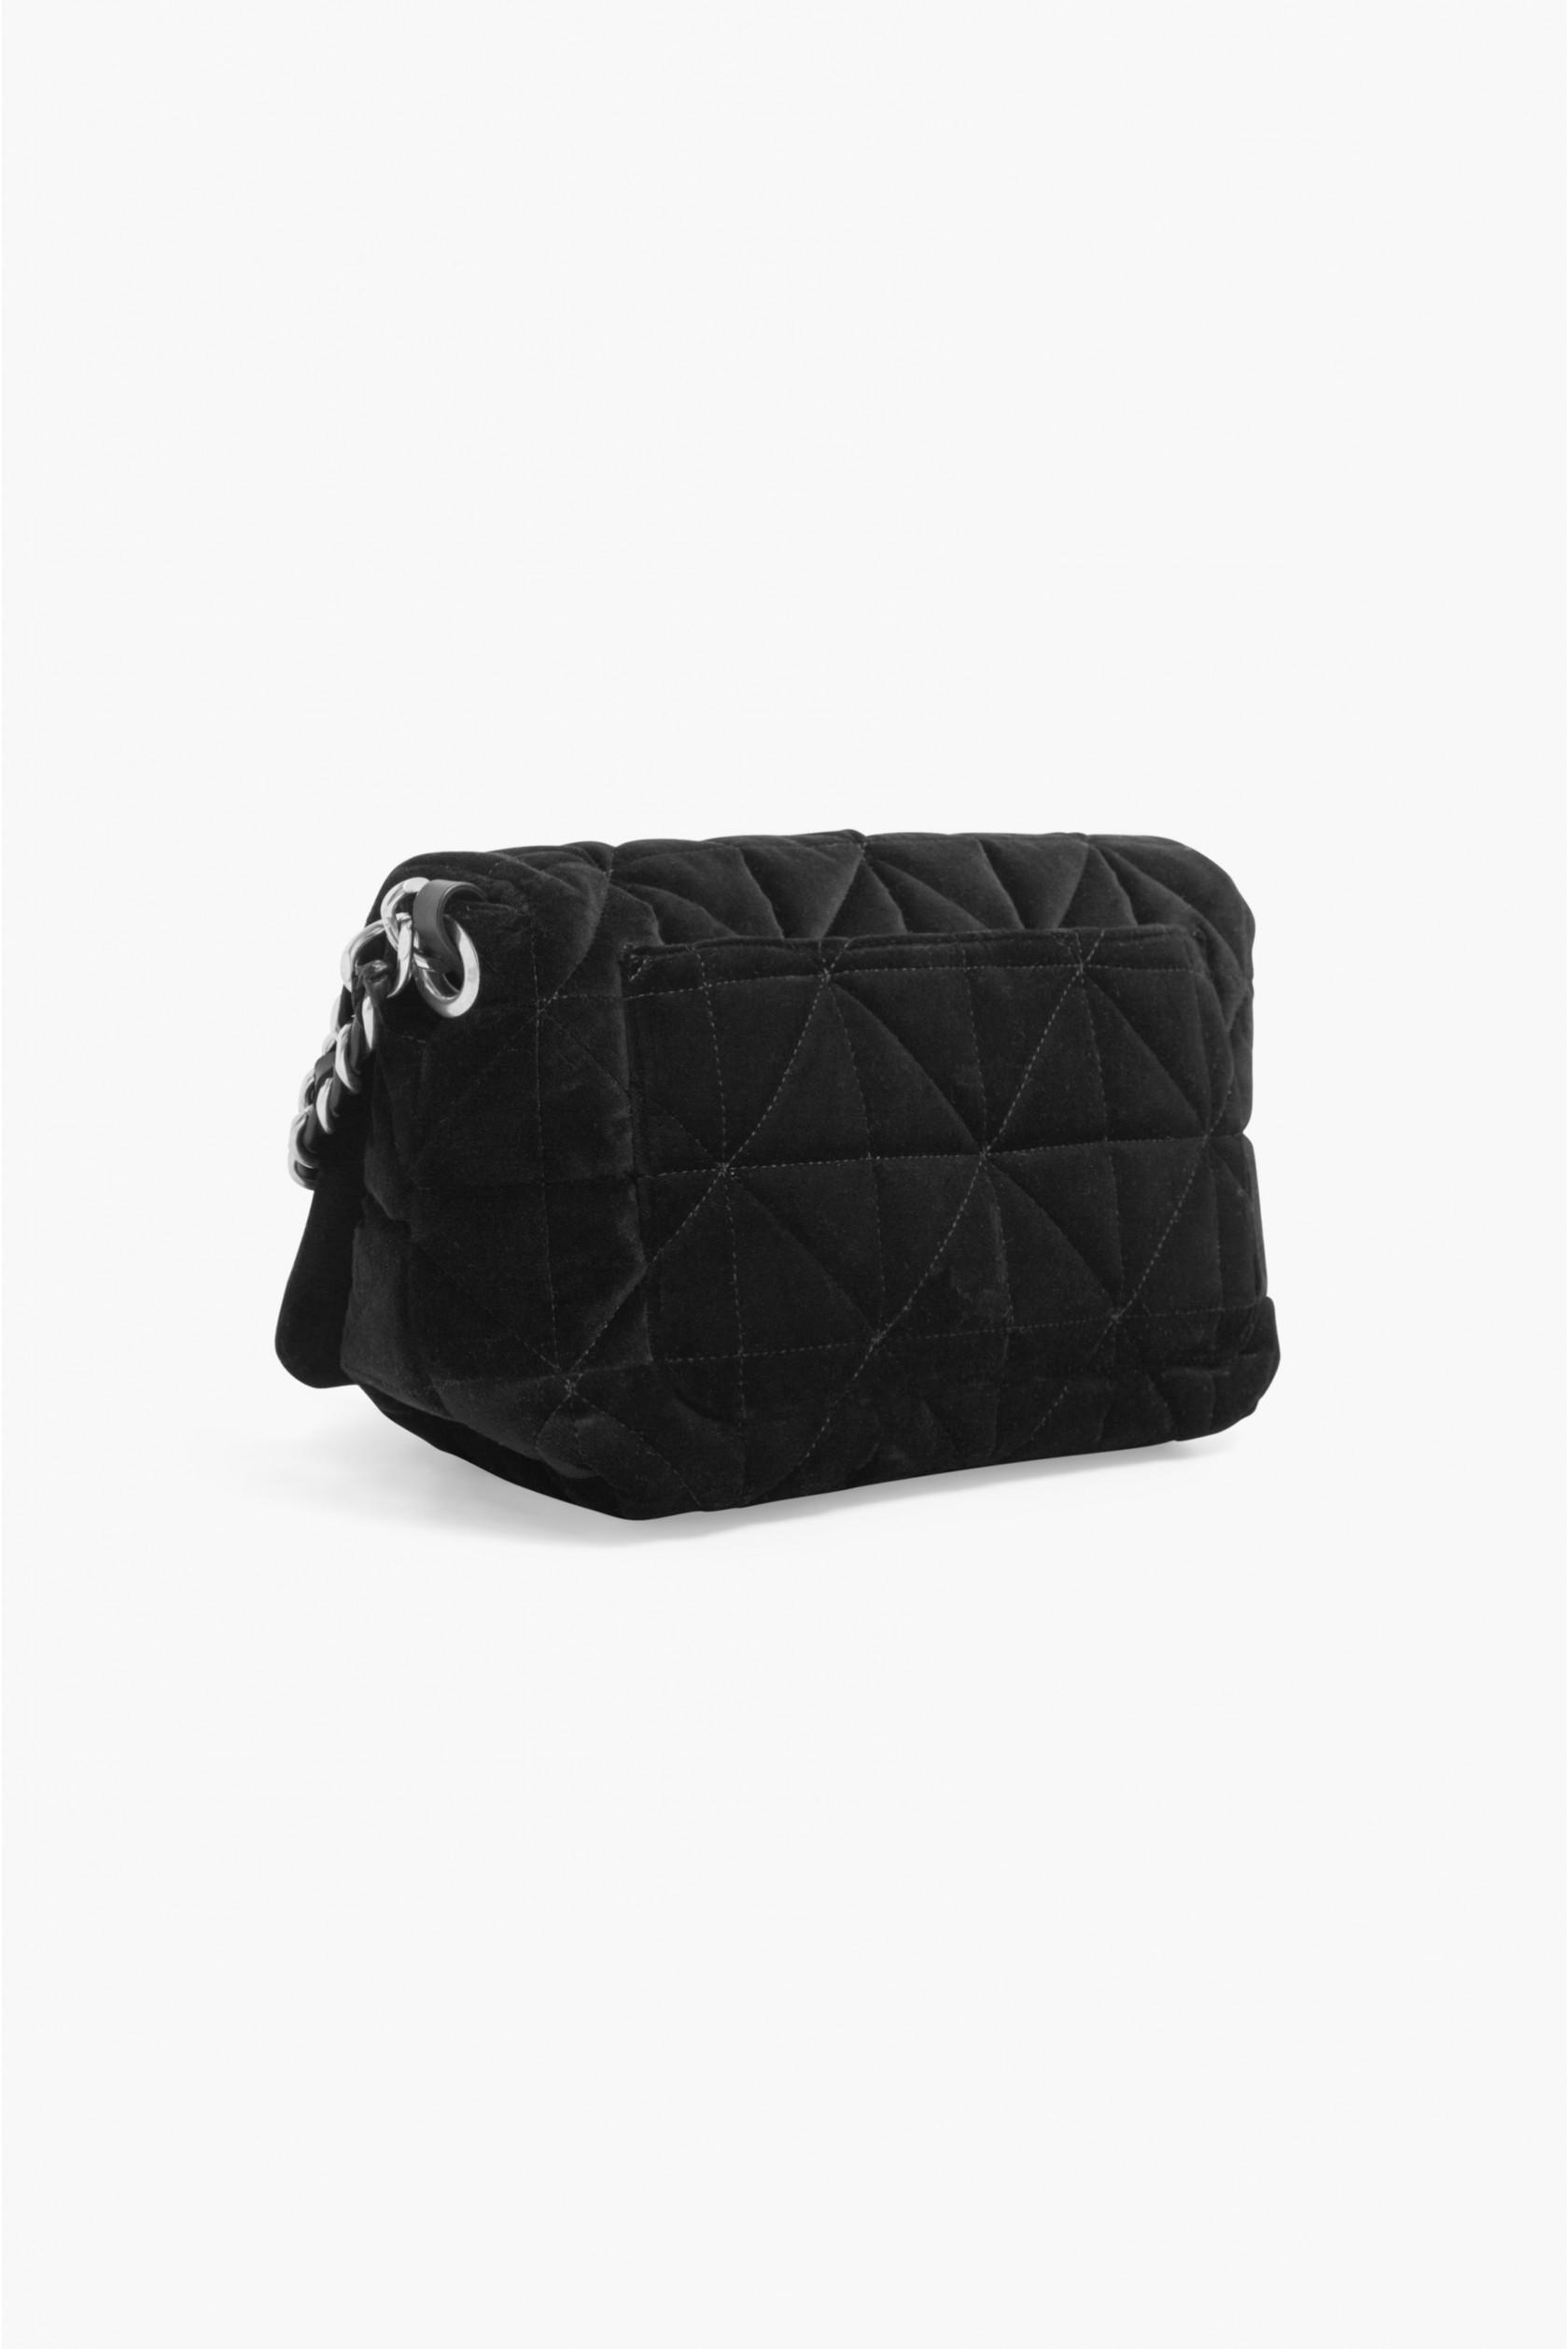 4690438383b Sonia Rykiel Le Copain Large Velvet Bag in Black - Lyst